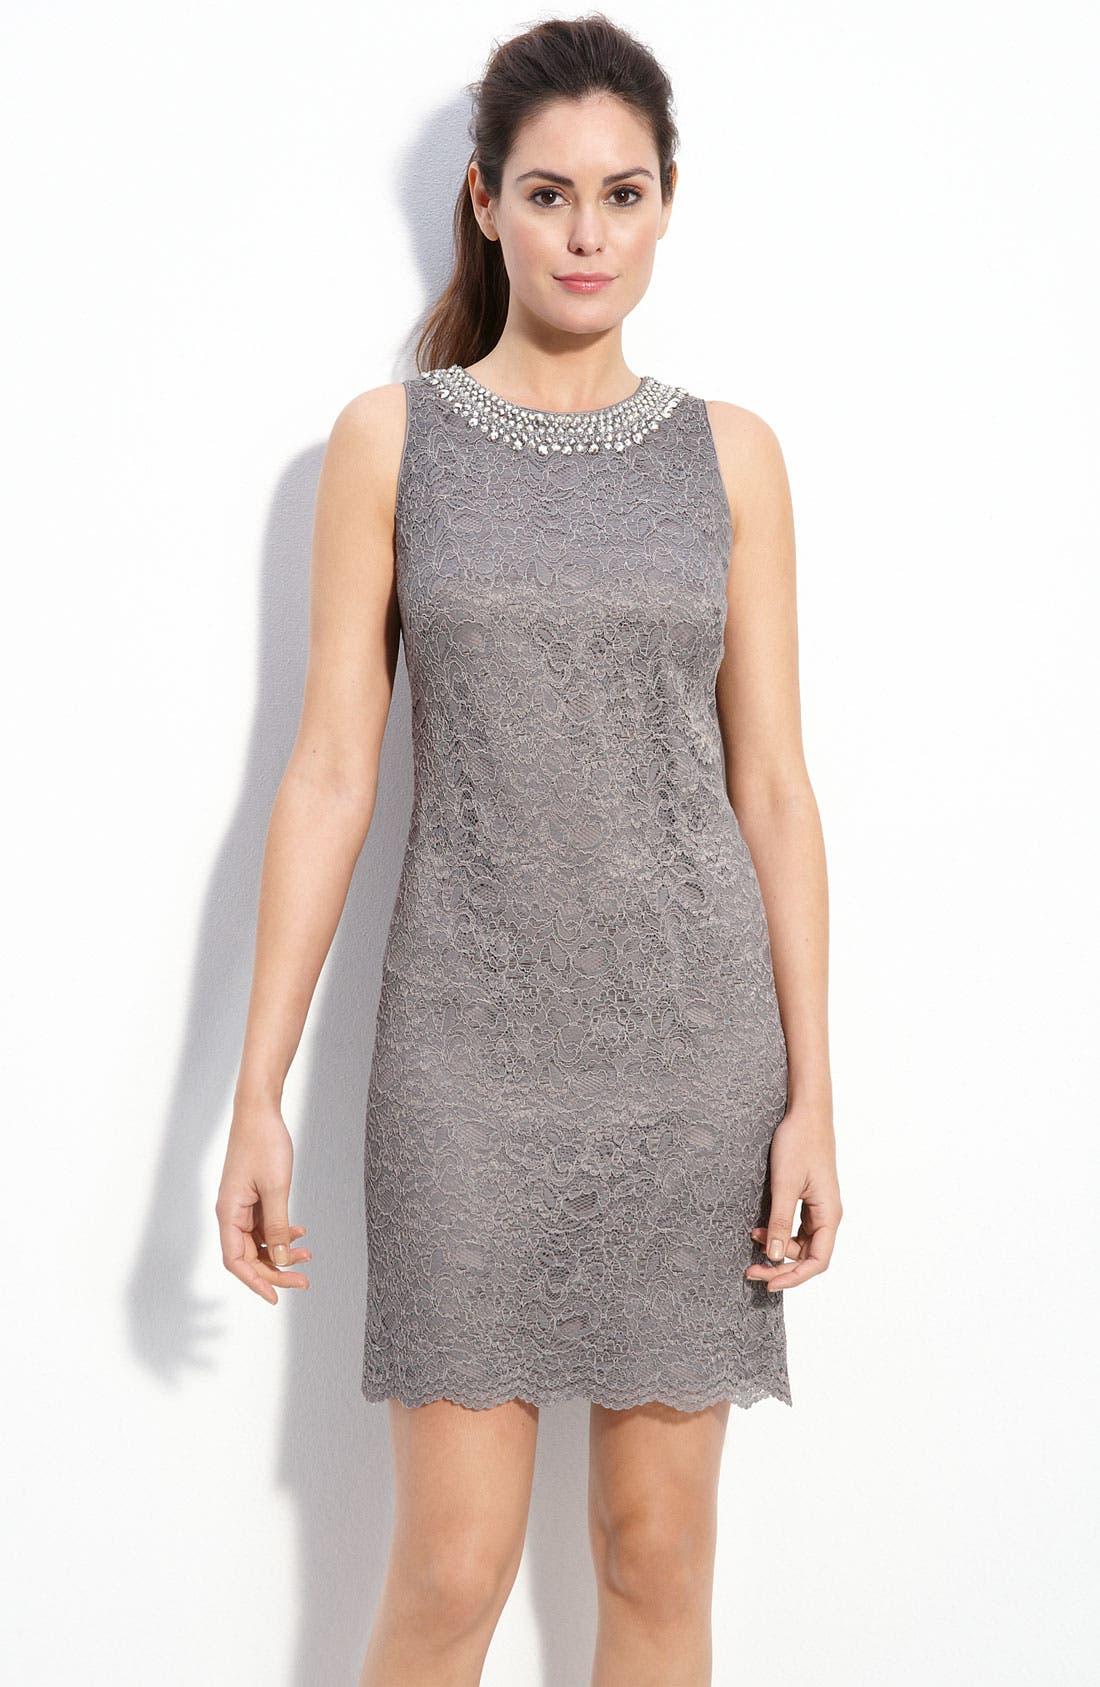 MAGGY LONDON, Beaded Lace Shift Dress, Main thumbnail 1, color, 020